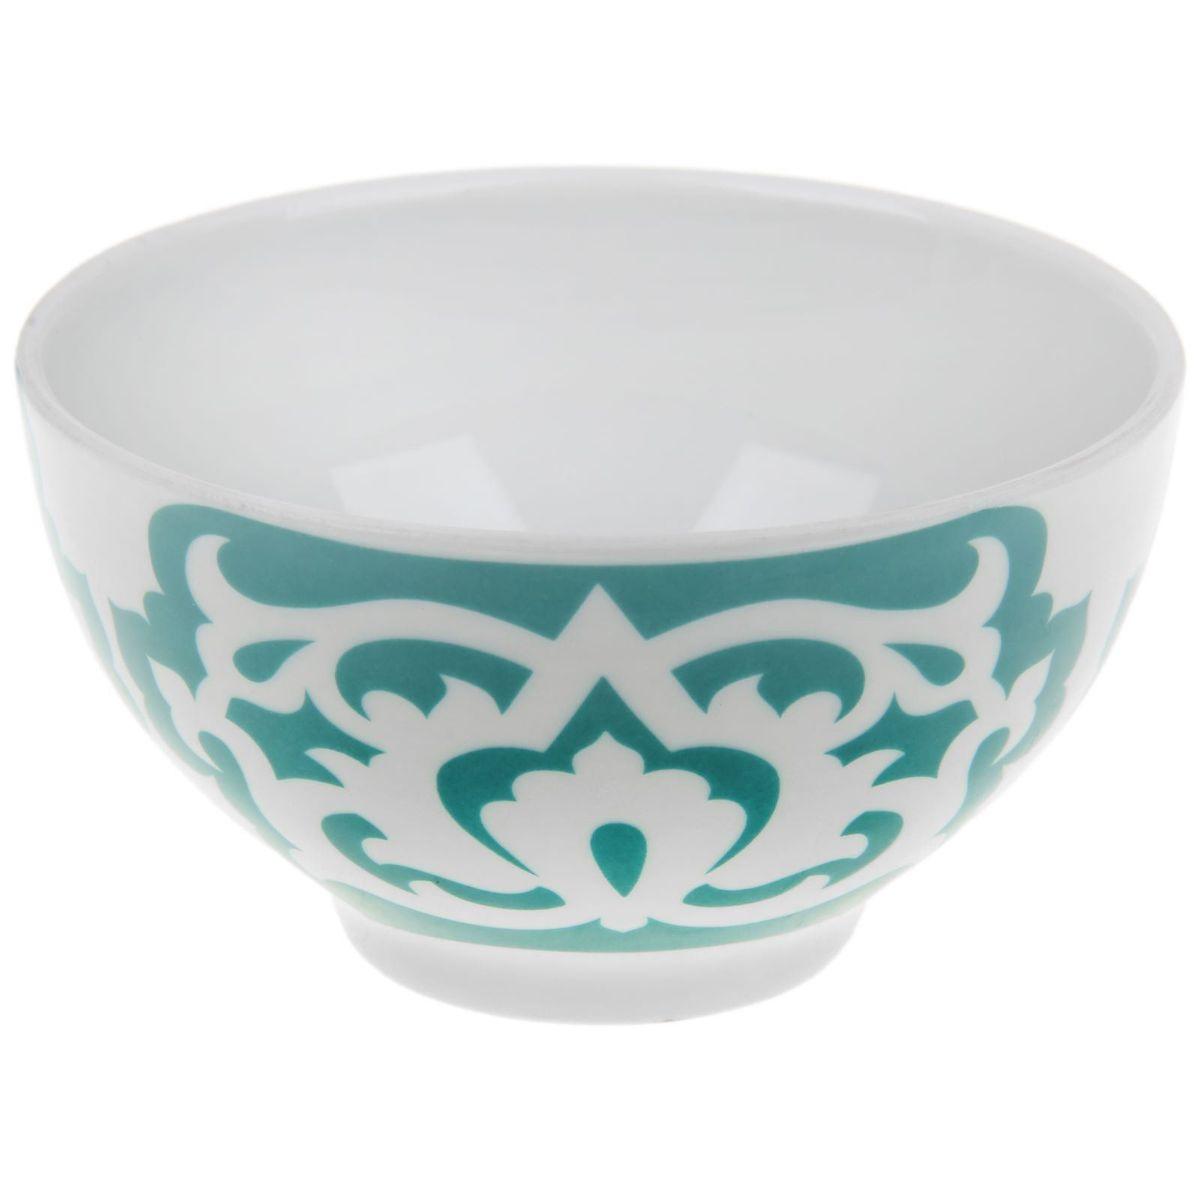 Пиала Азия, цвет: зеленый, 330 мл1303822